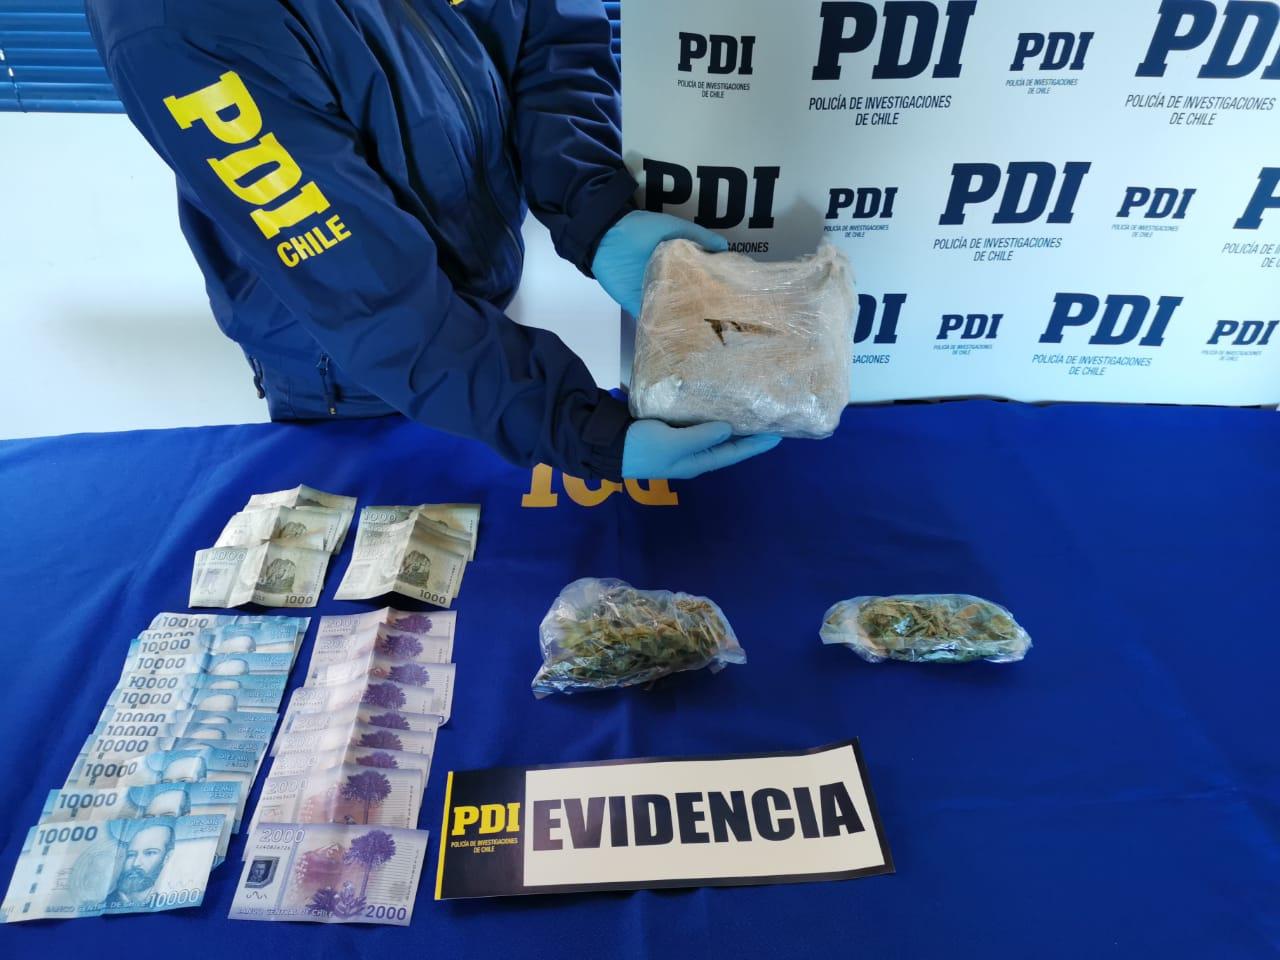 PDI detuvo a sujeto que traía encomienda de marihuana a Mulchén